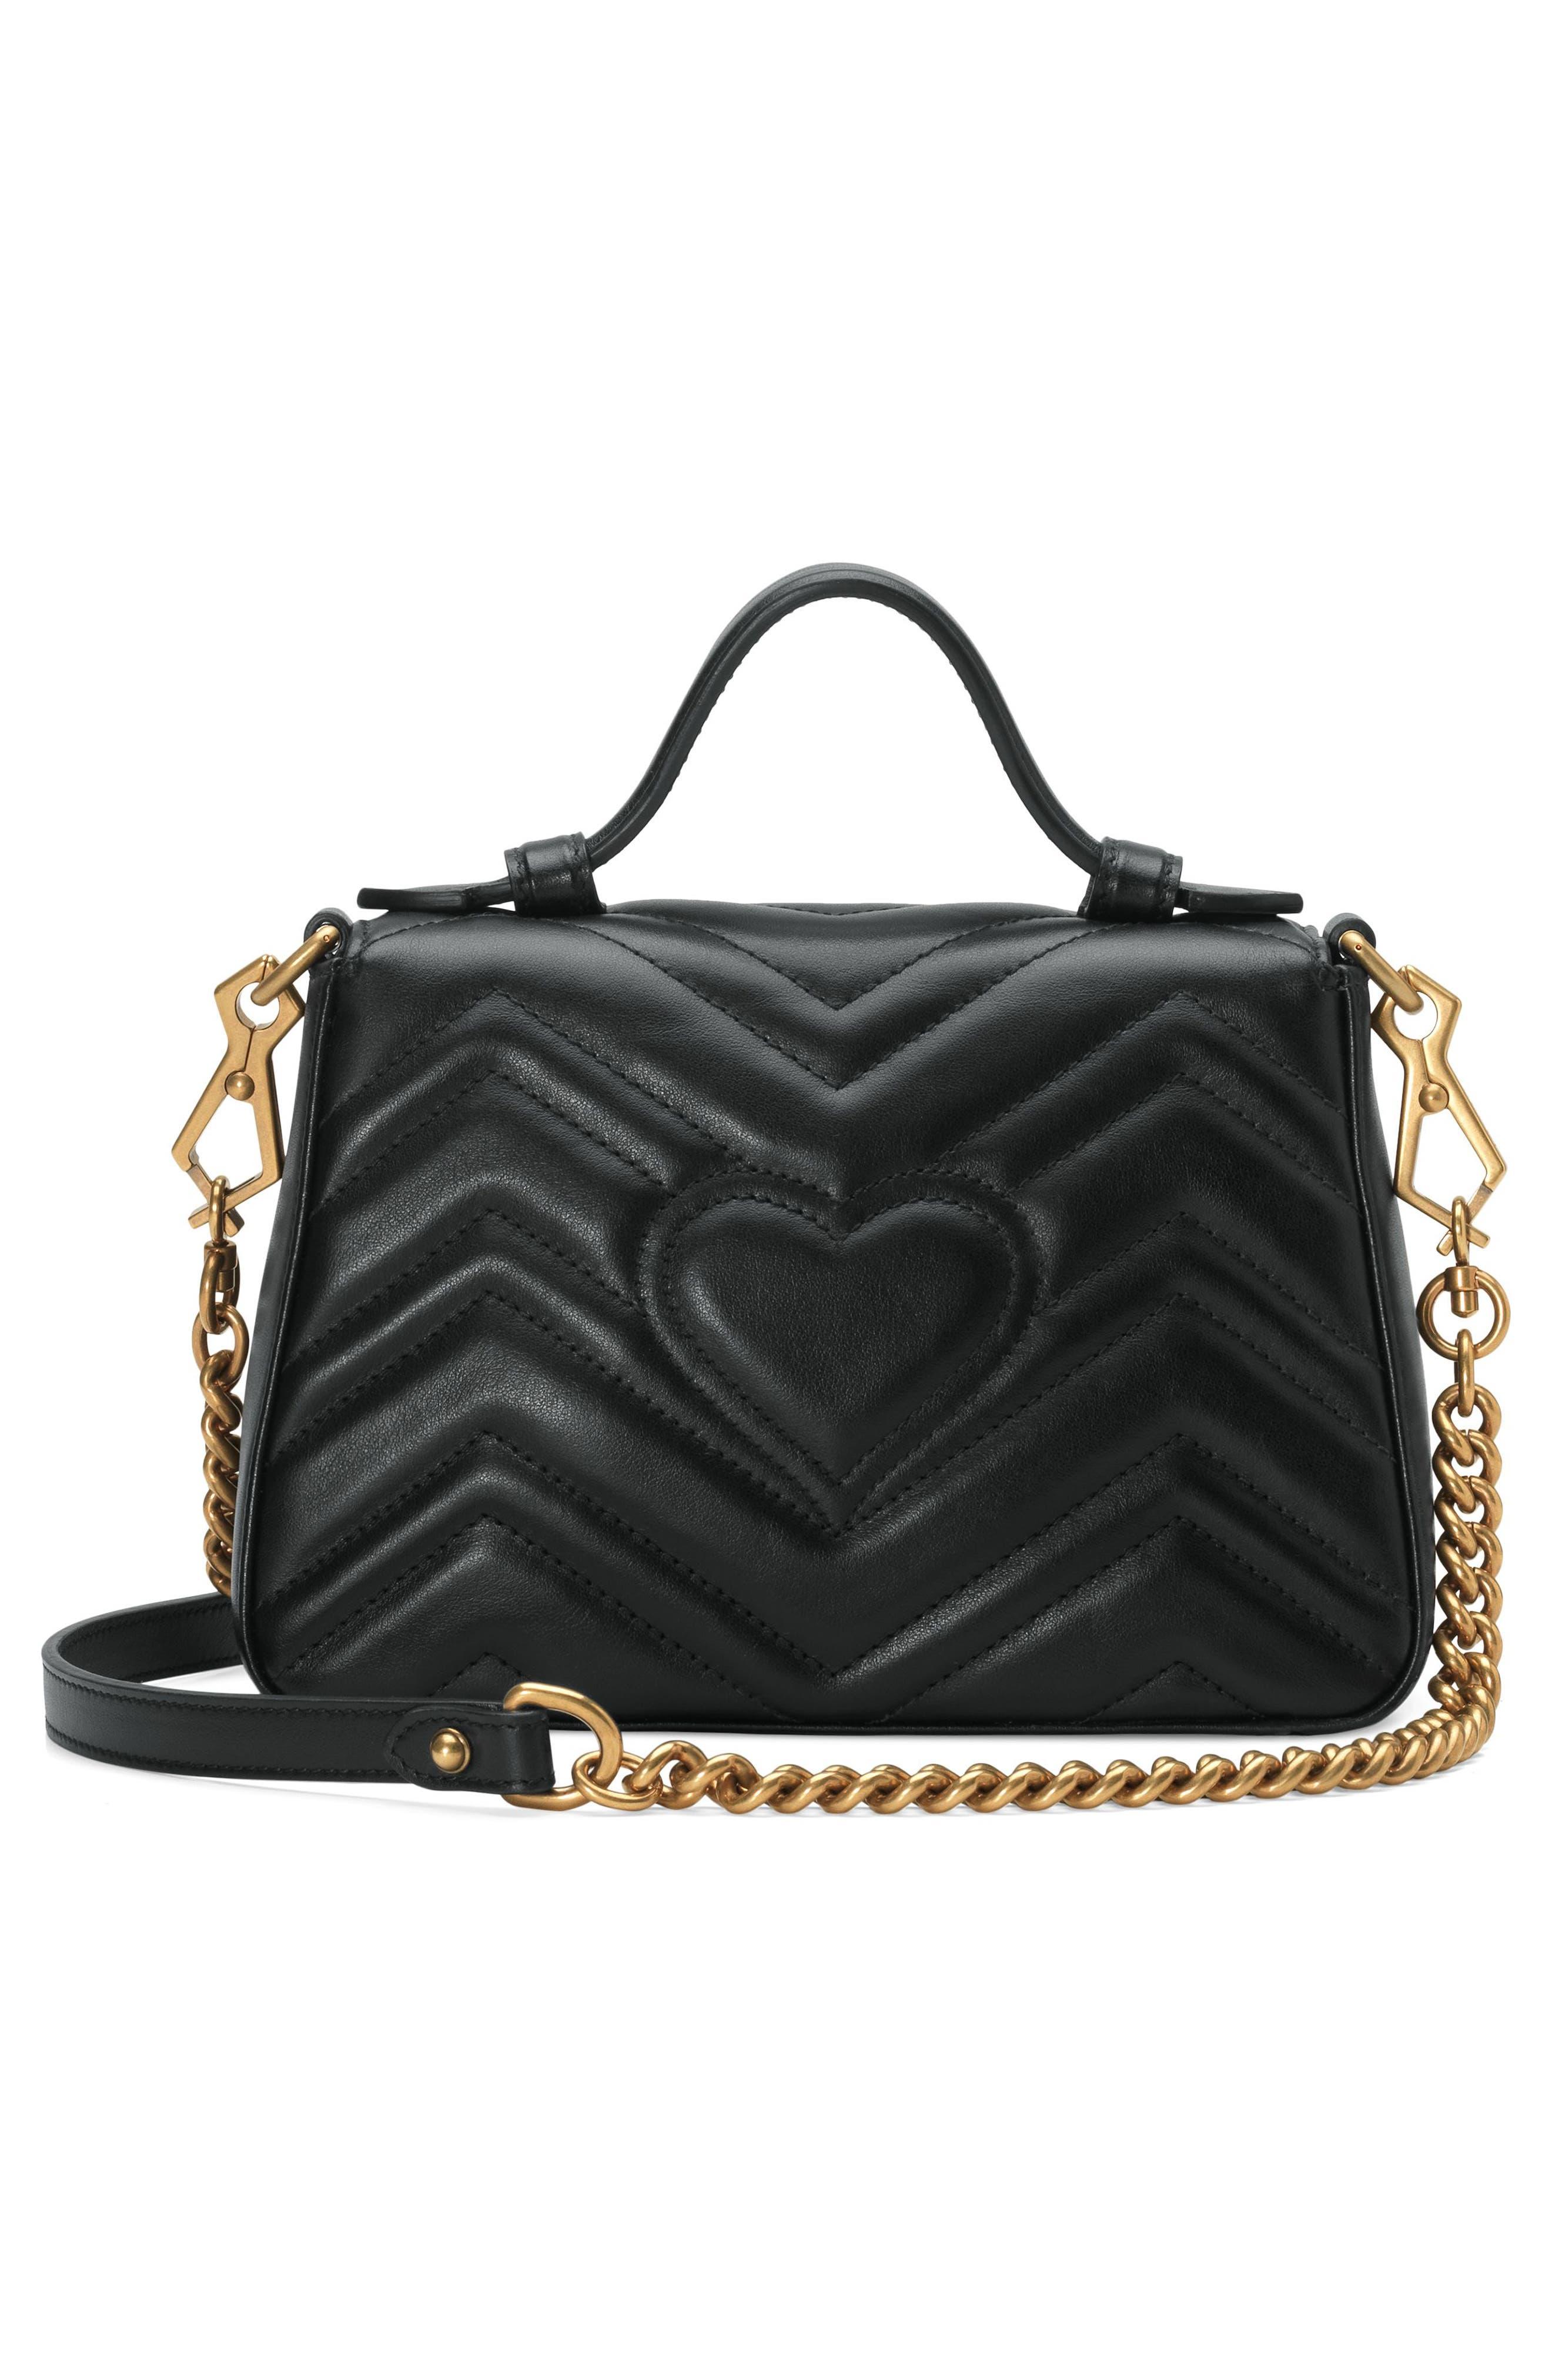 Marmont 2.0 Leather Top Handle Bag,                             Alternate thumbnail 2, color,                             NERO